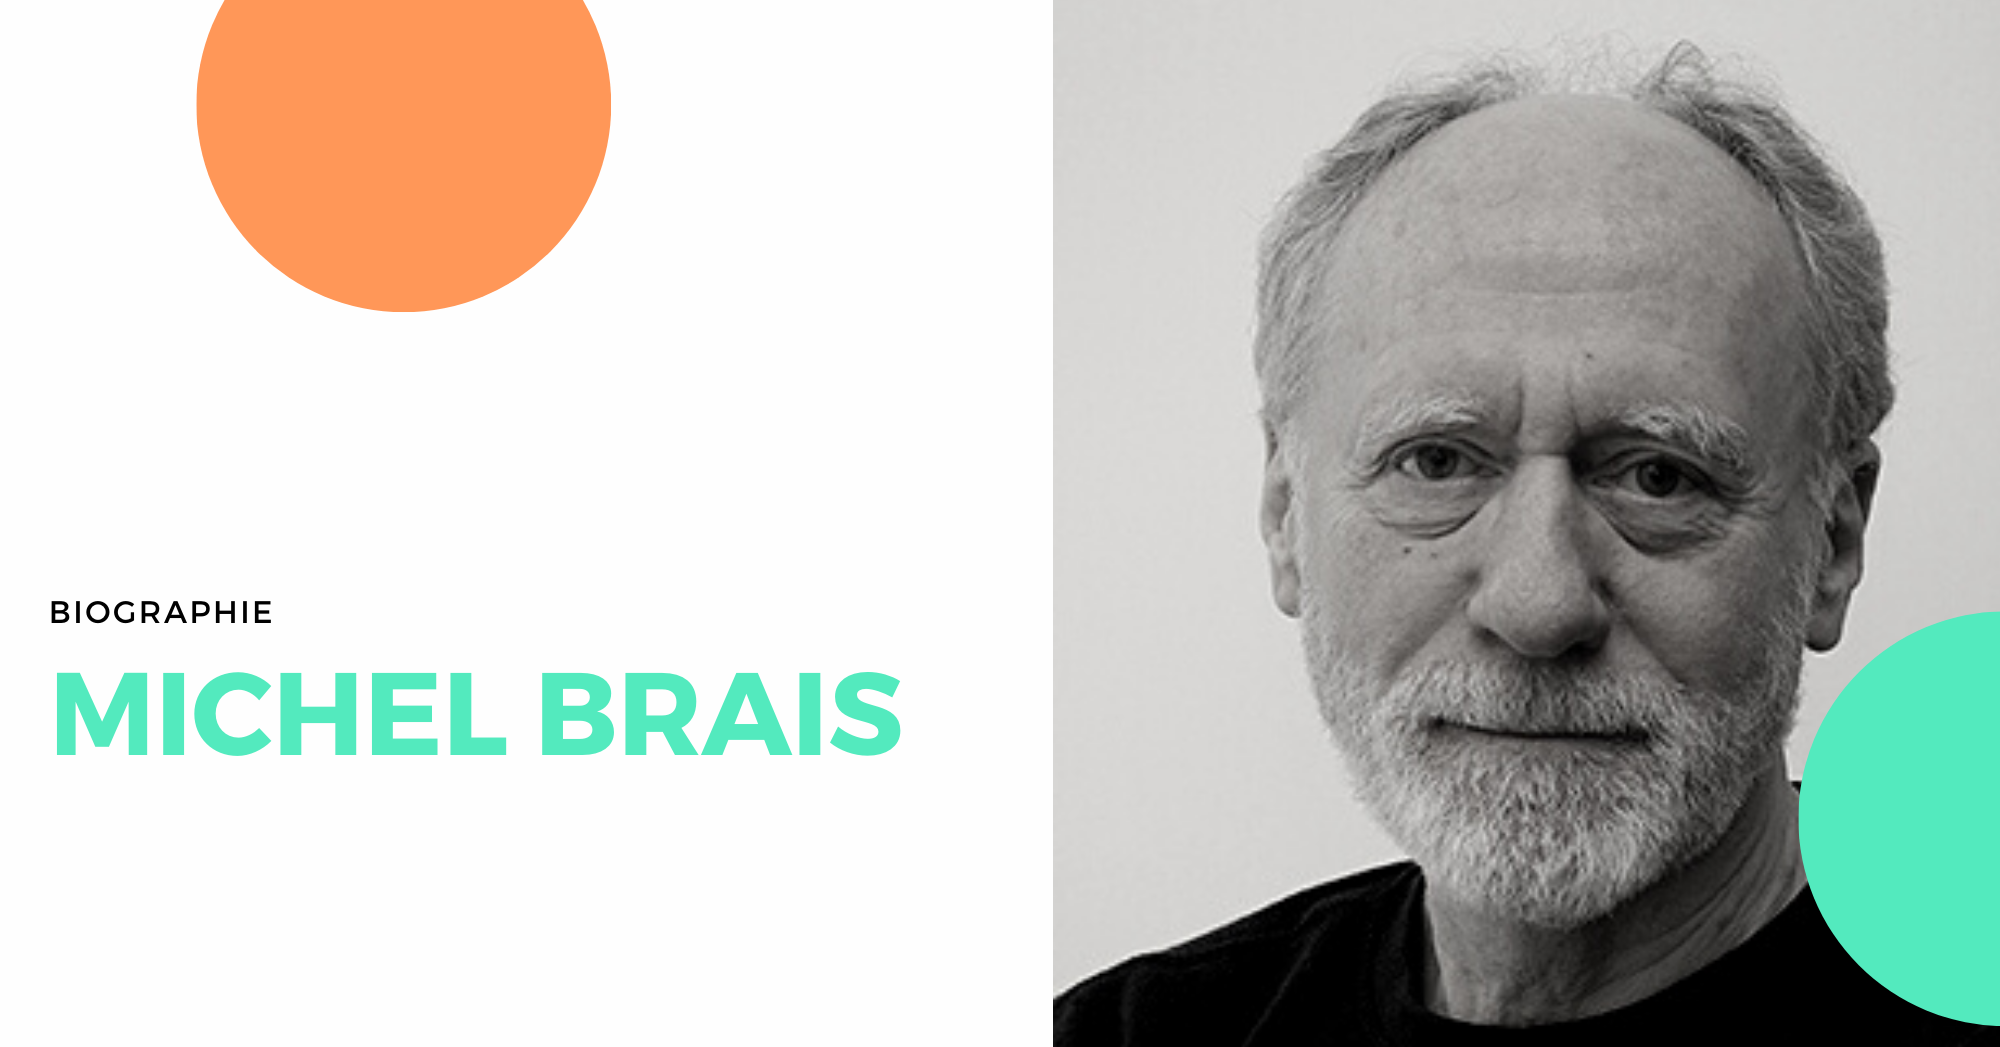 Michel Brais